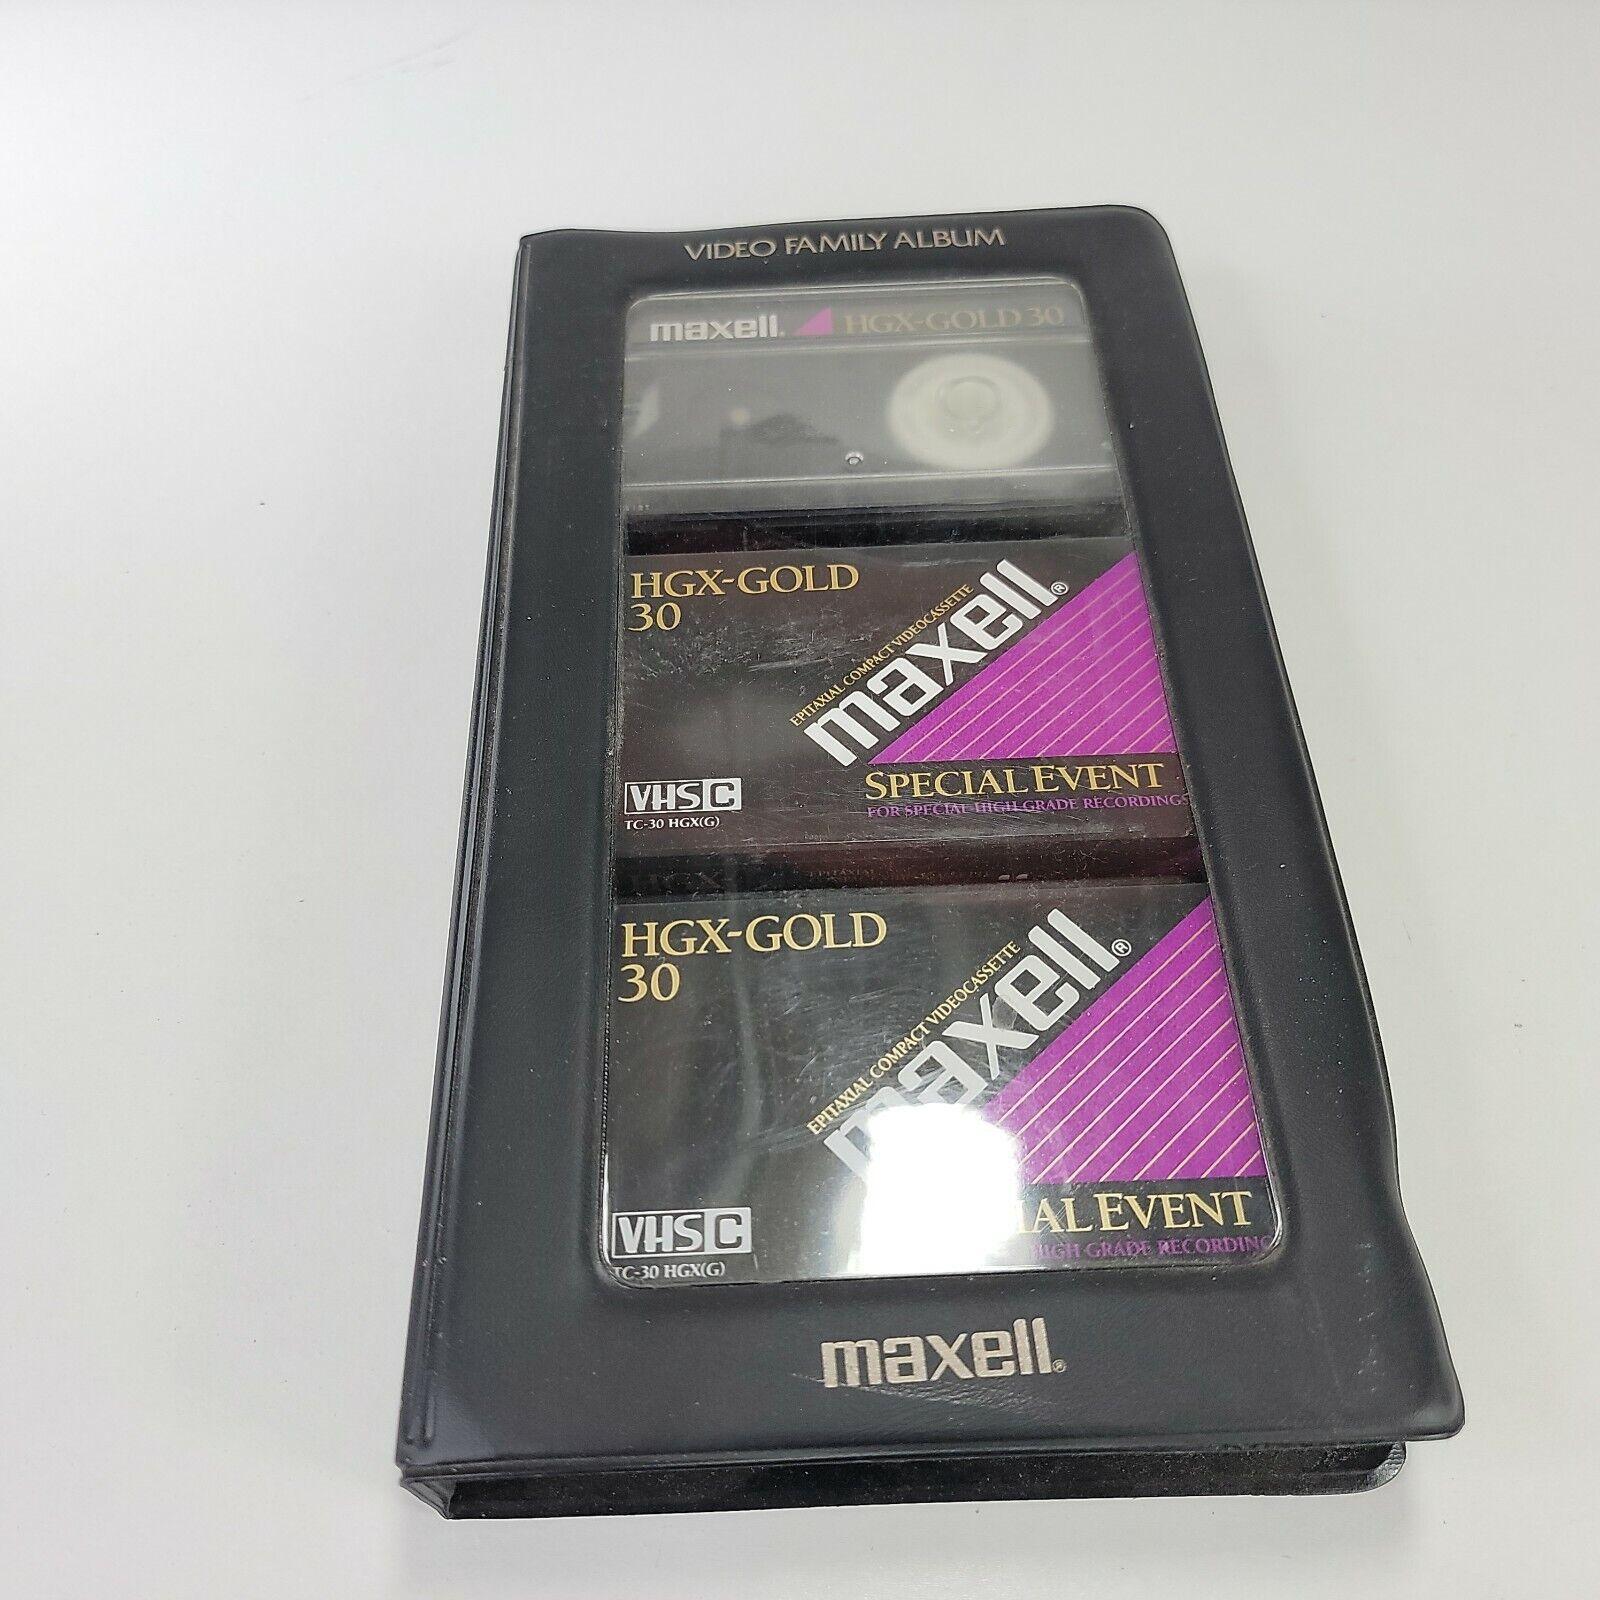 Video Family Album 3 Maxell HGX-Gold TC30 VHS-C High Grade Video Cassettes